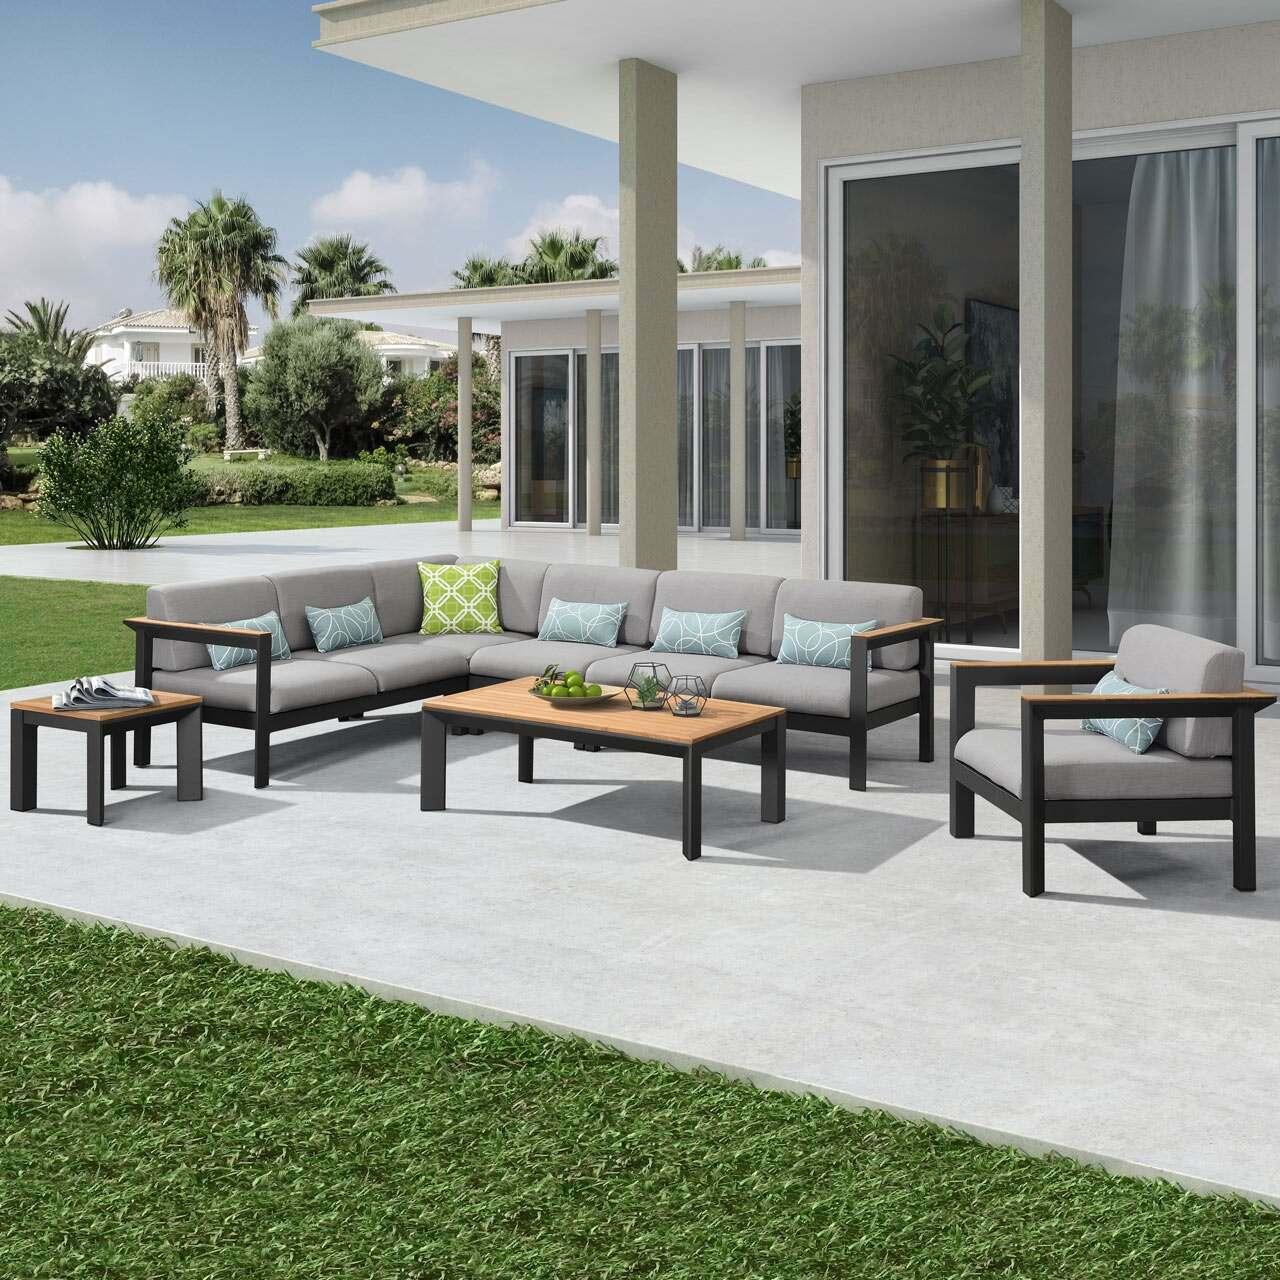 Harrier Luxury Aluminium/Teak Garden Corner Sofa & Table Sets